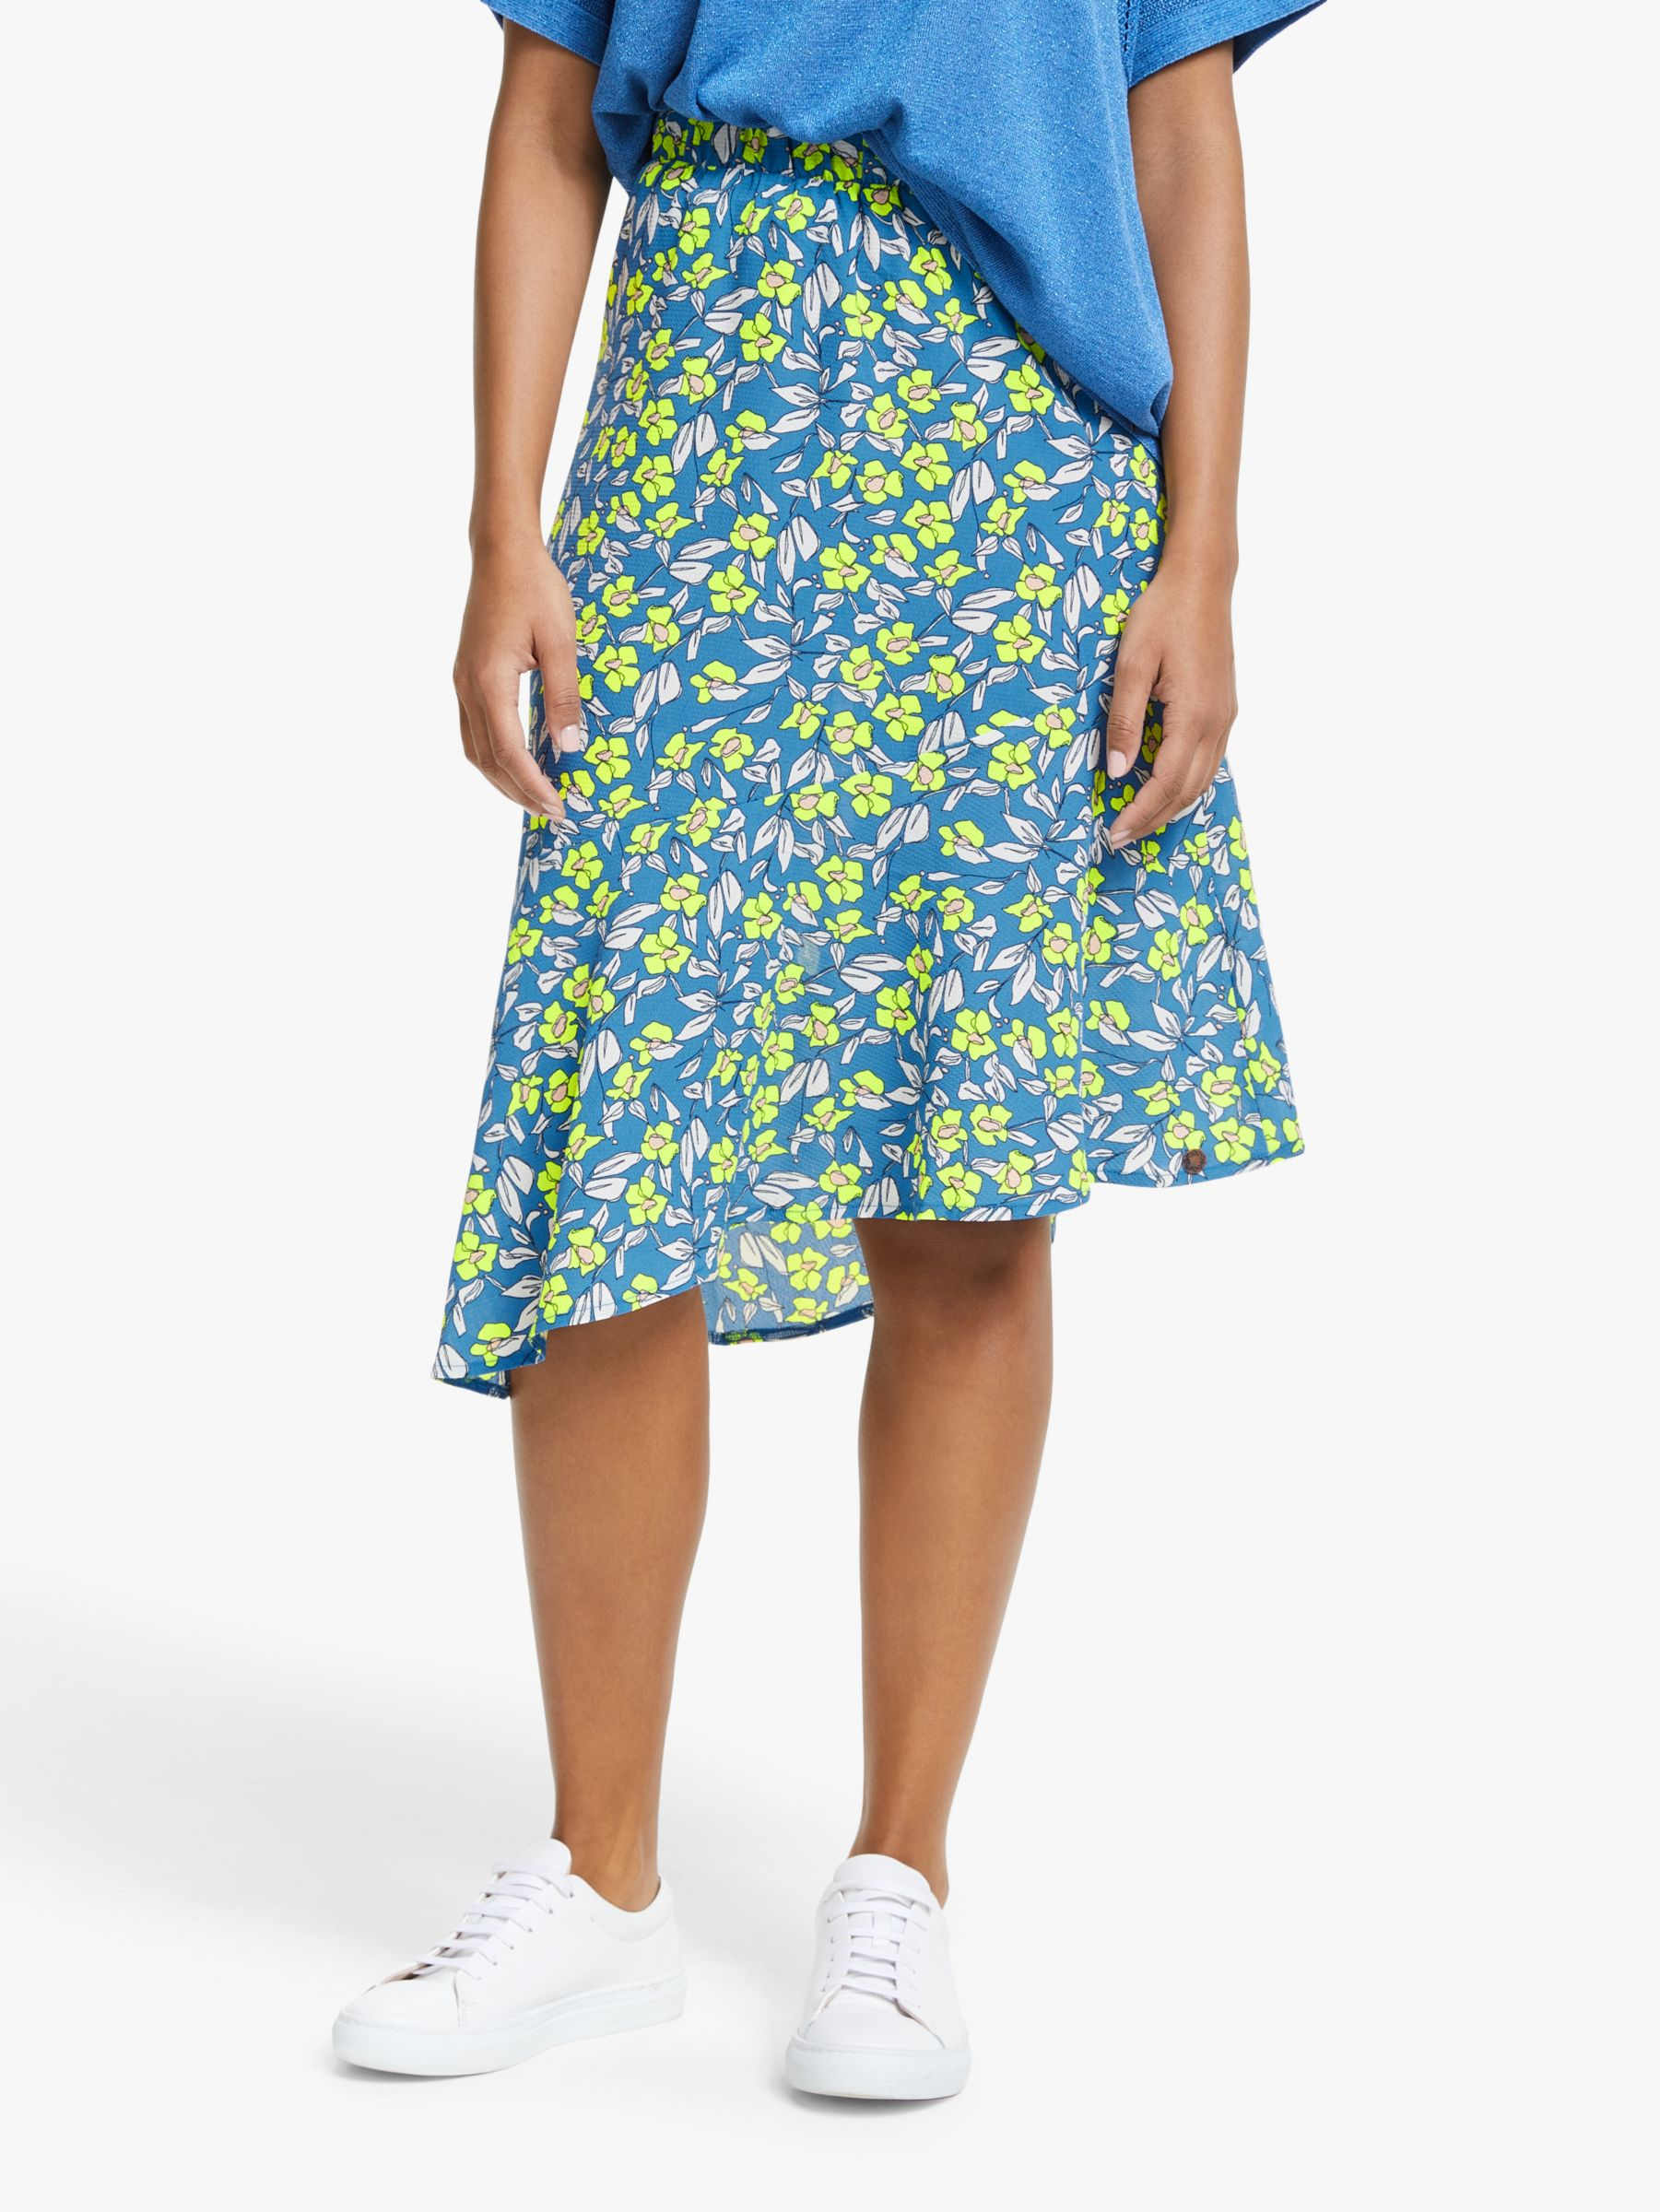 Numph Numph Nuaideen Floral Skirt, Pacific Coast